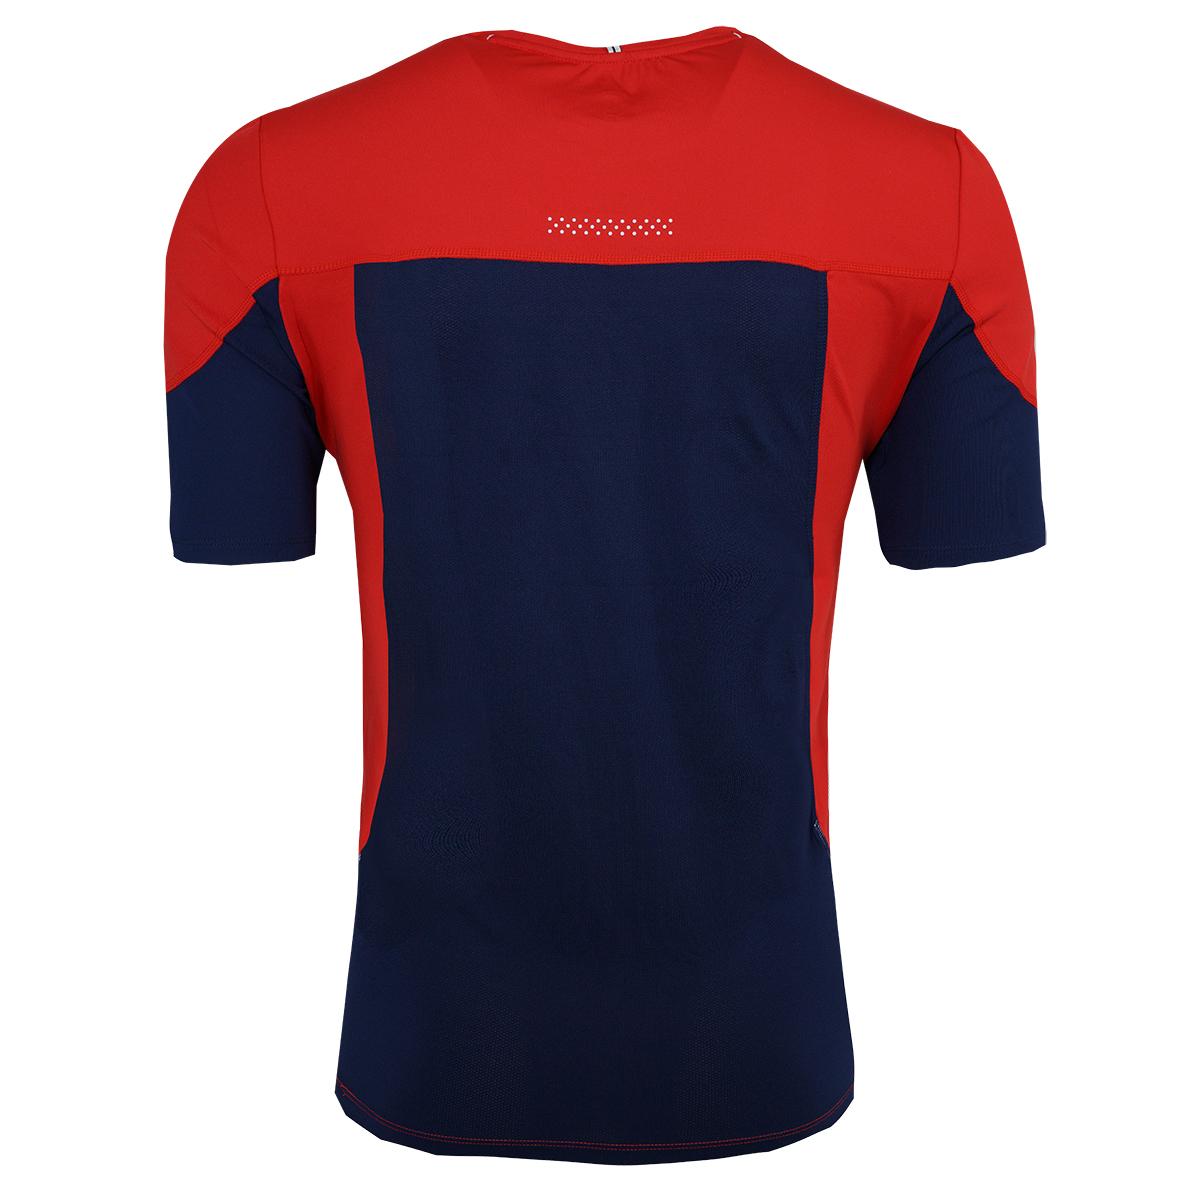 Body-Glove-Men-039-s-Signature-Color-Block-T-Shirt thumbnail 9